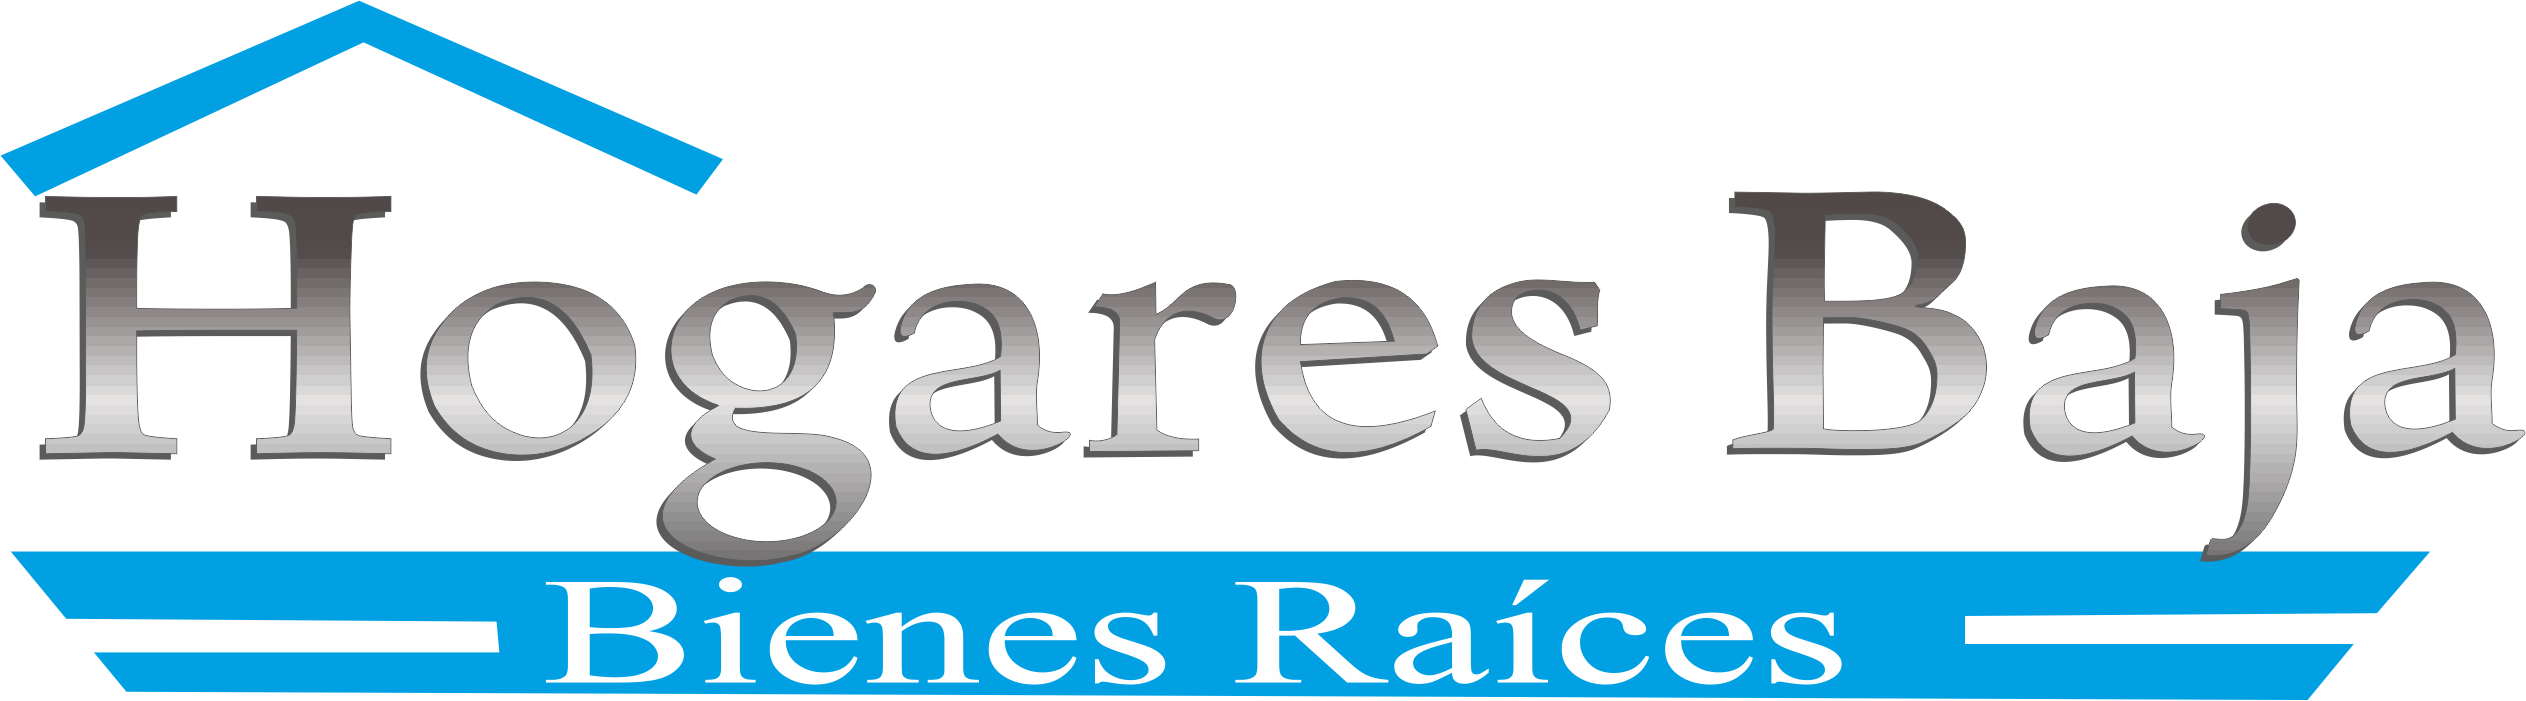 HOGARES_BAJA_COLORES_PNG__1_.png